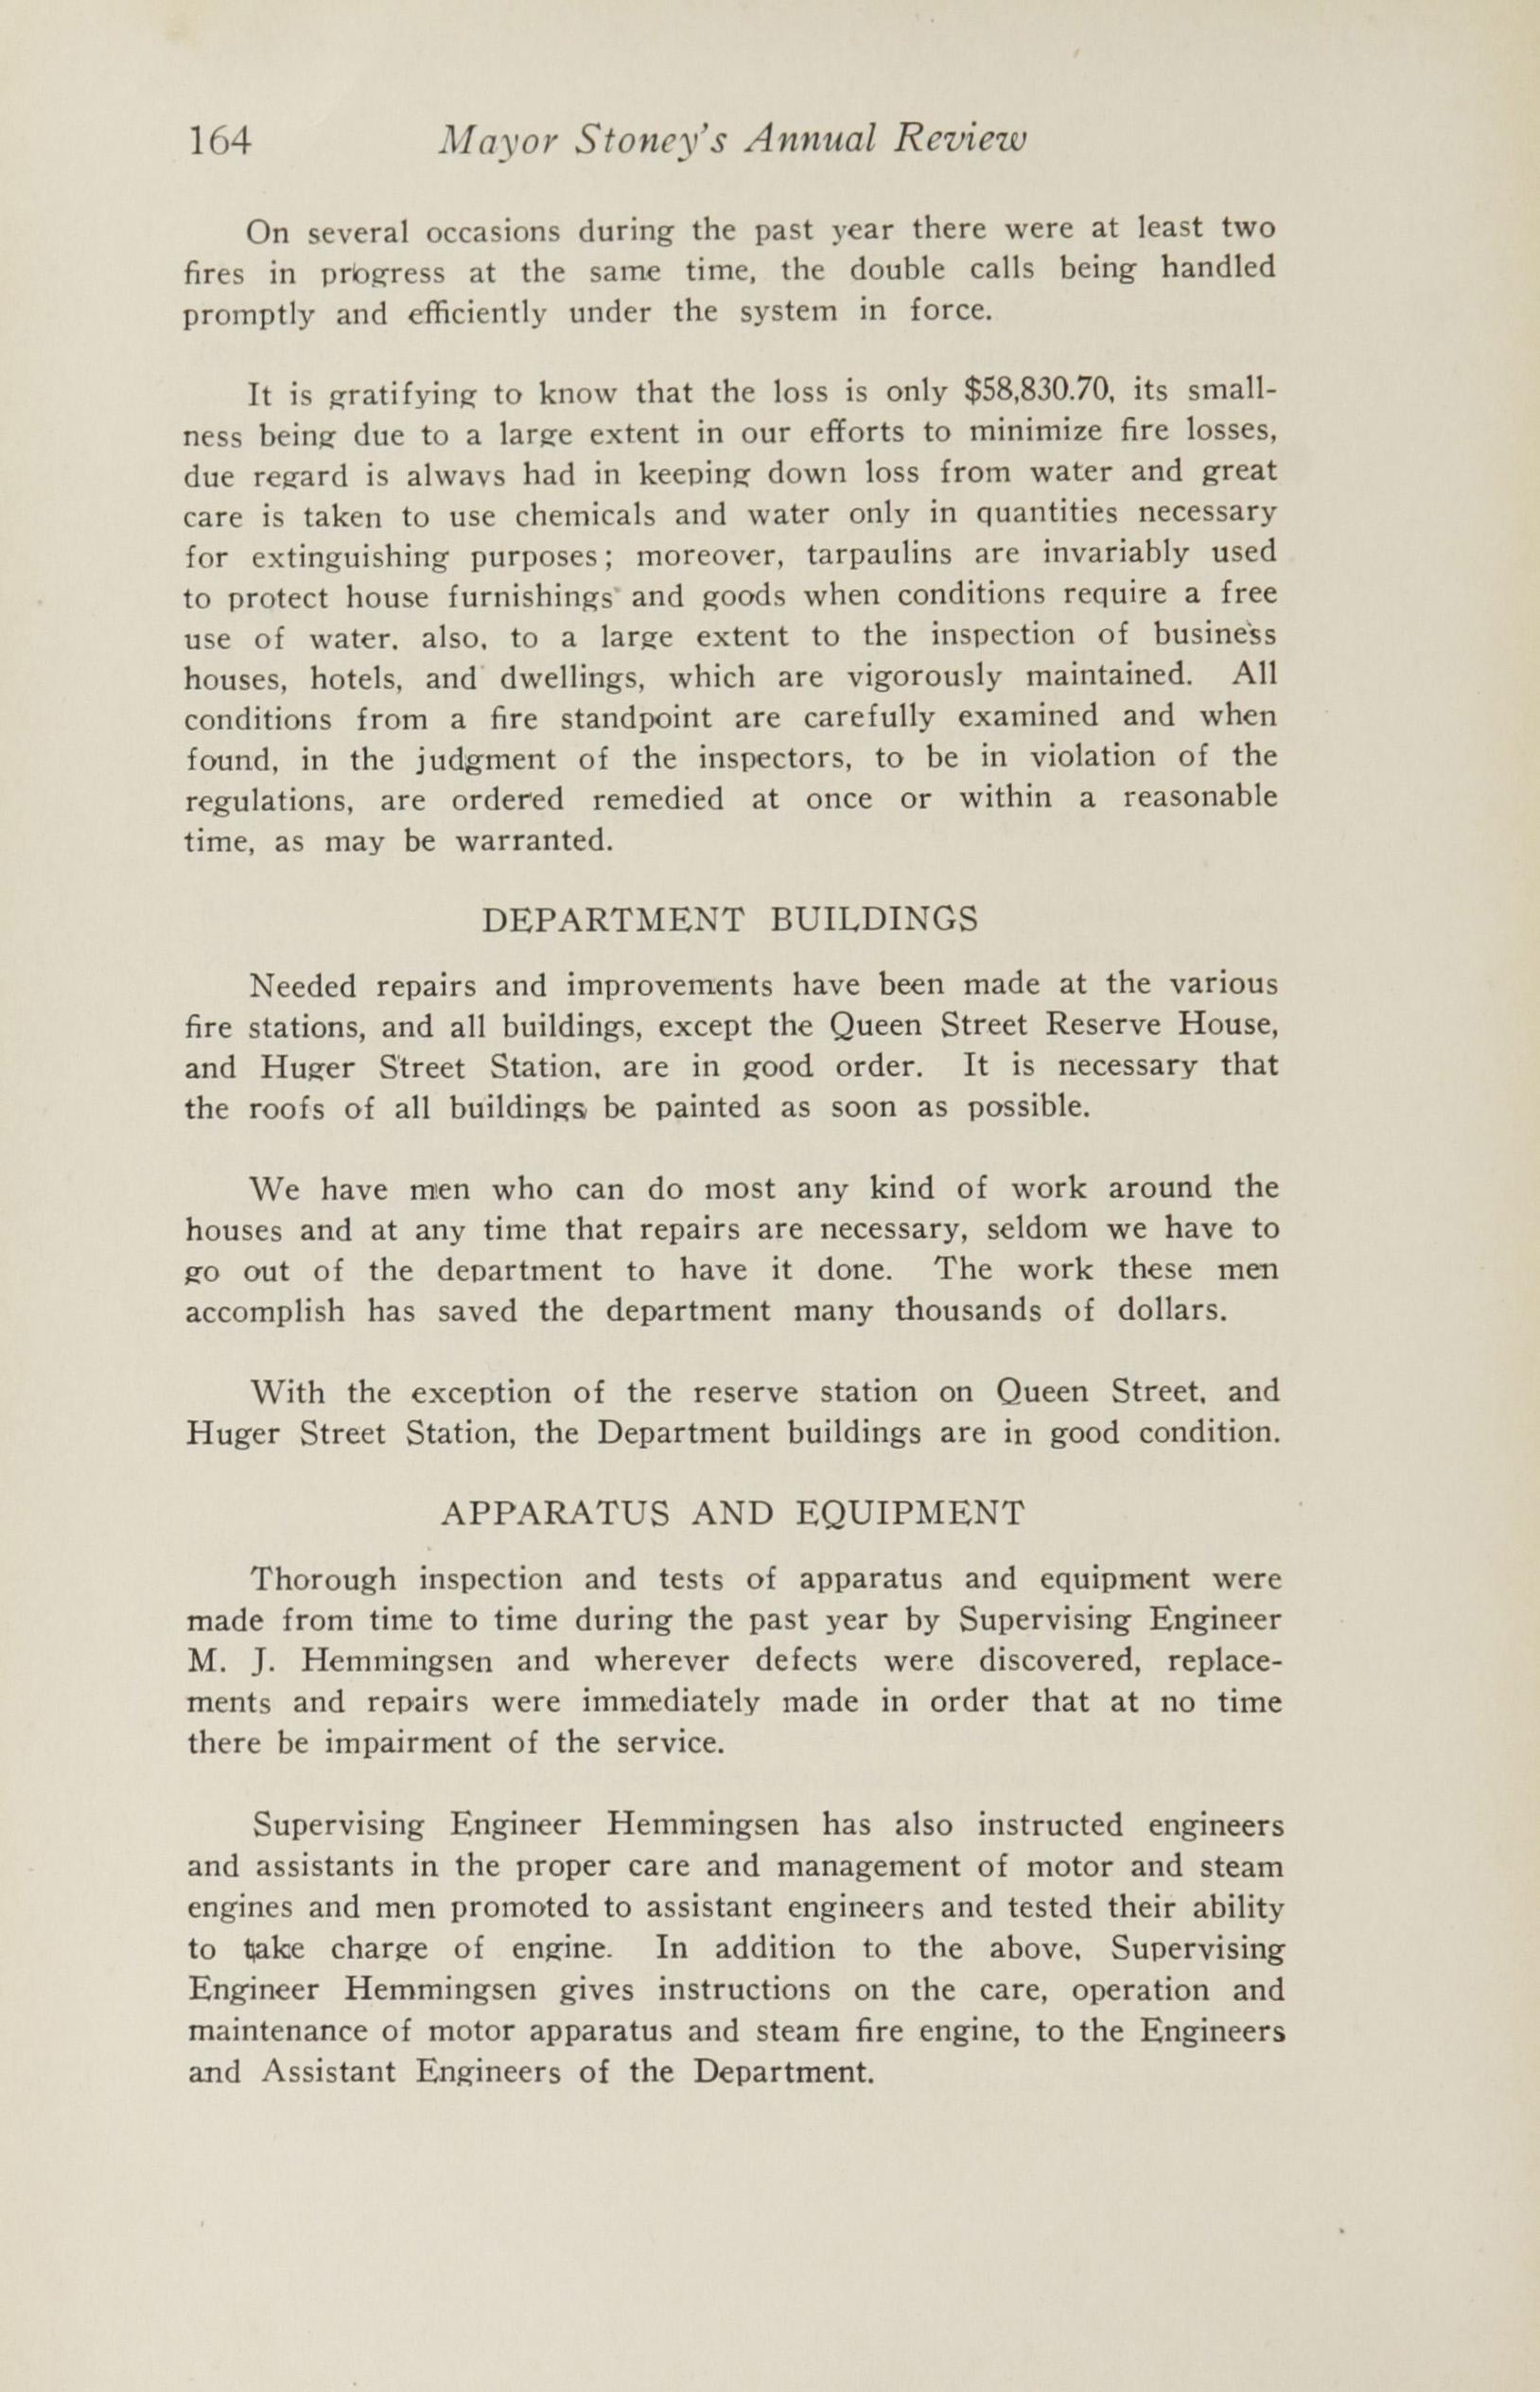 Charleston Yearbook, 1929, page 164